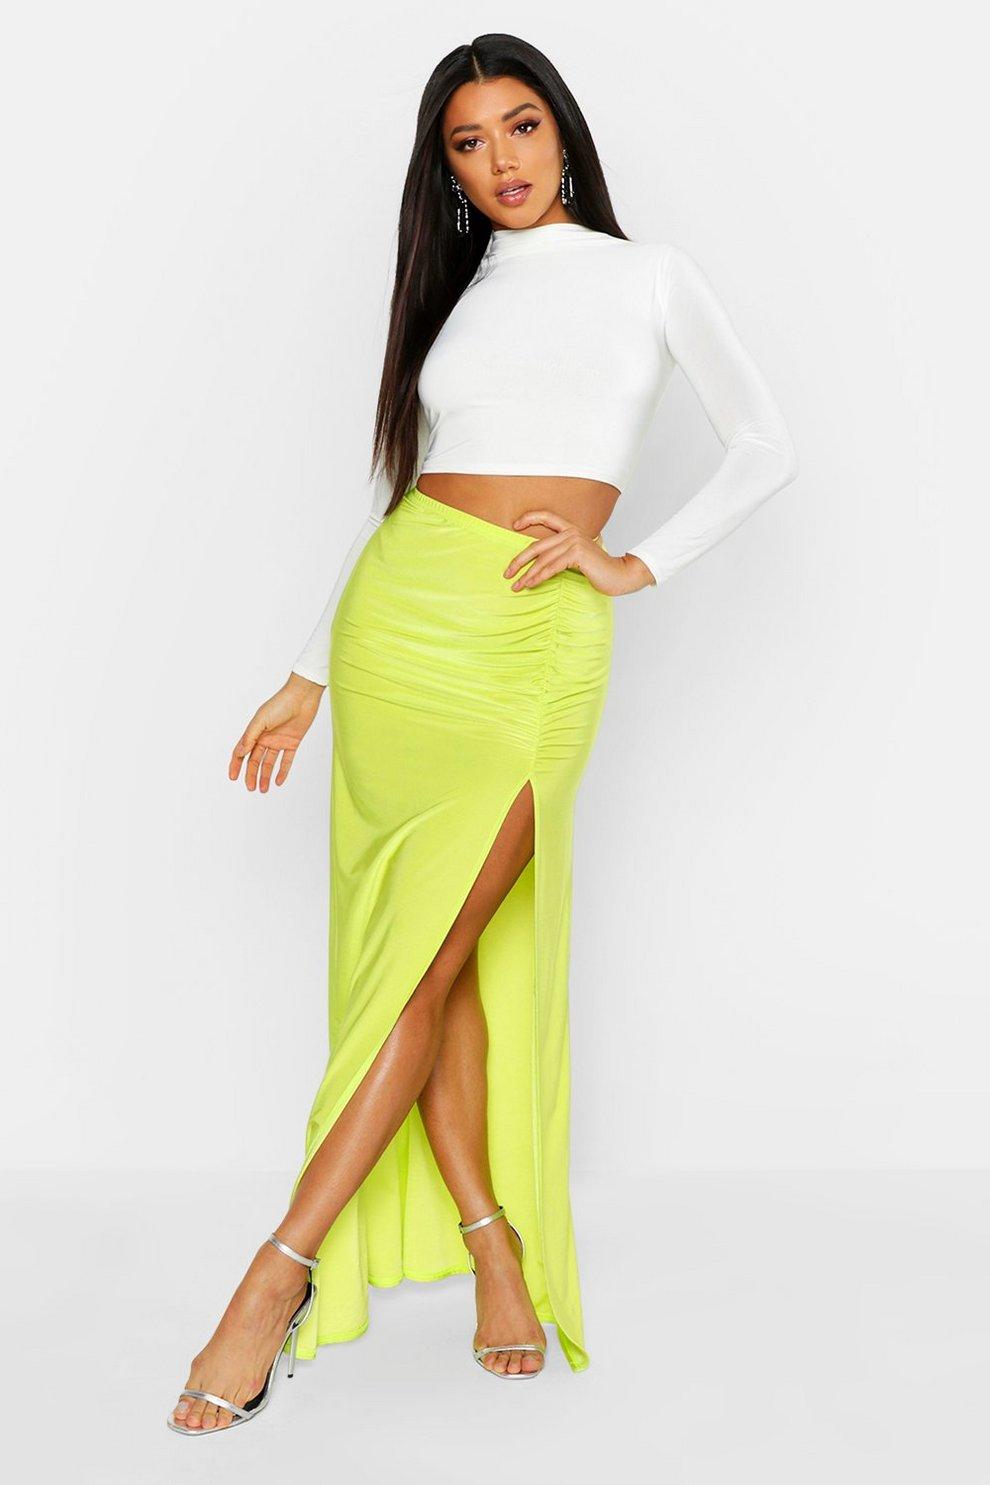 a5b9a21d86 Green Split Maxi Skirt – DACC